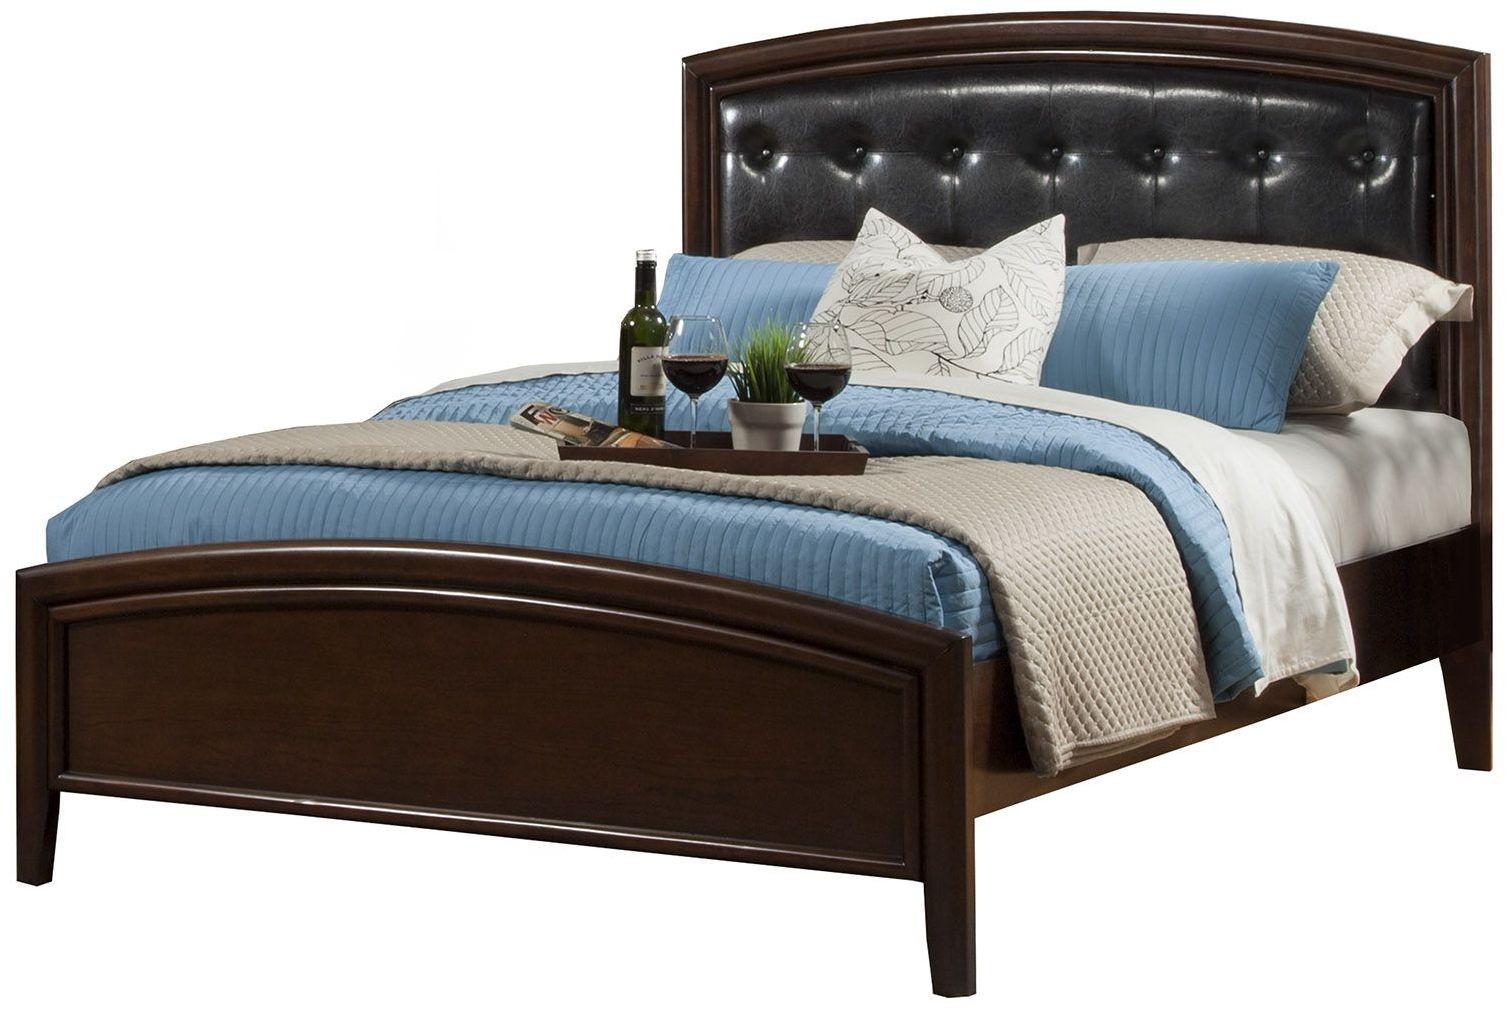 La Jolla Espresso King Platform Bed, 988-07EK, Alpine